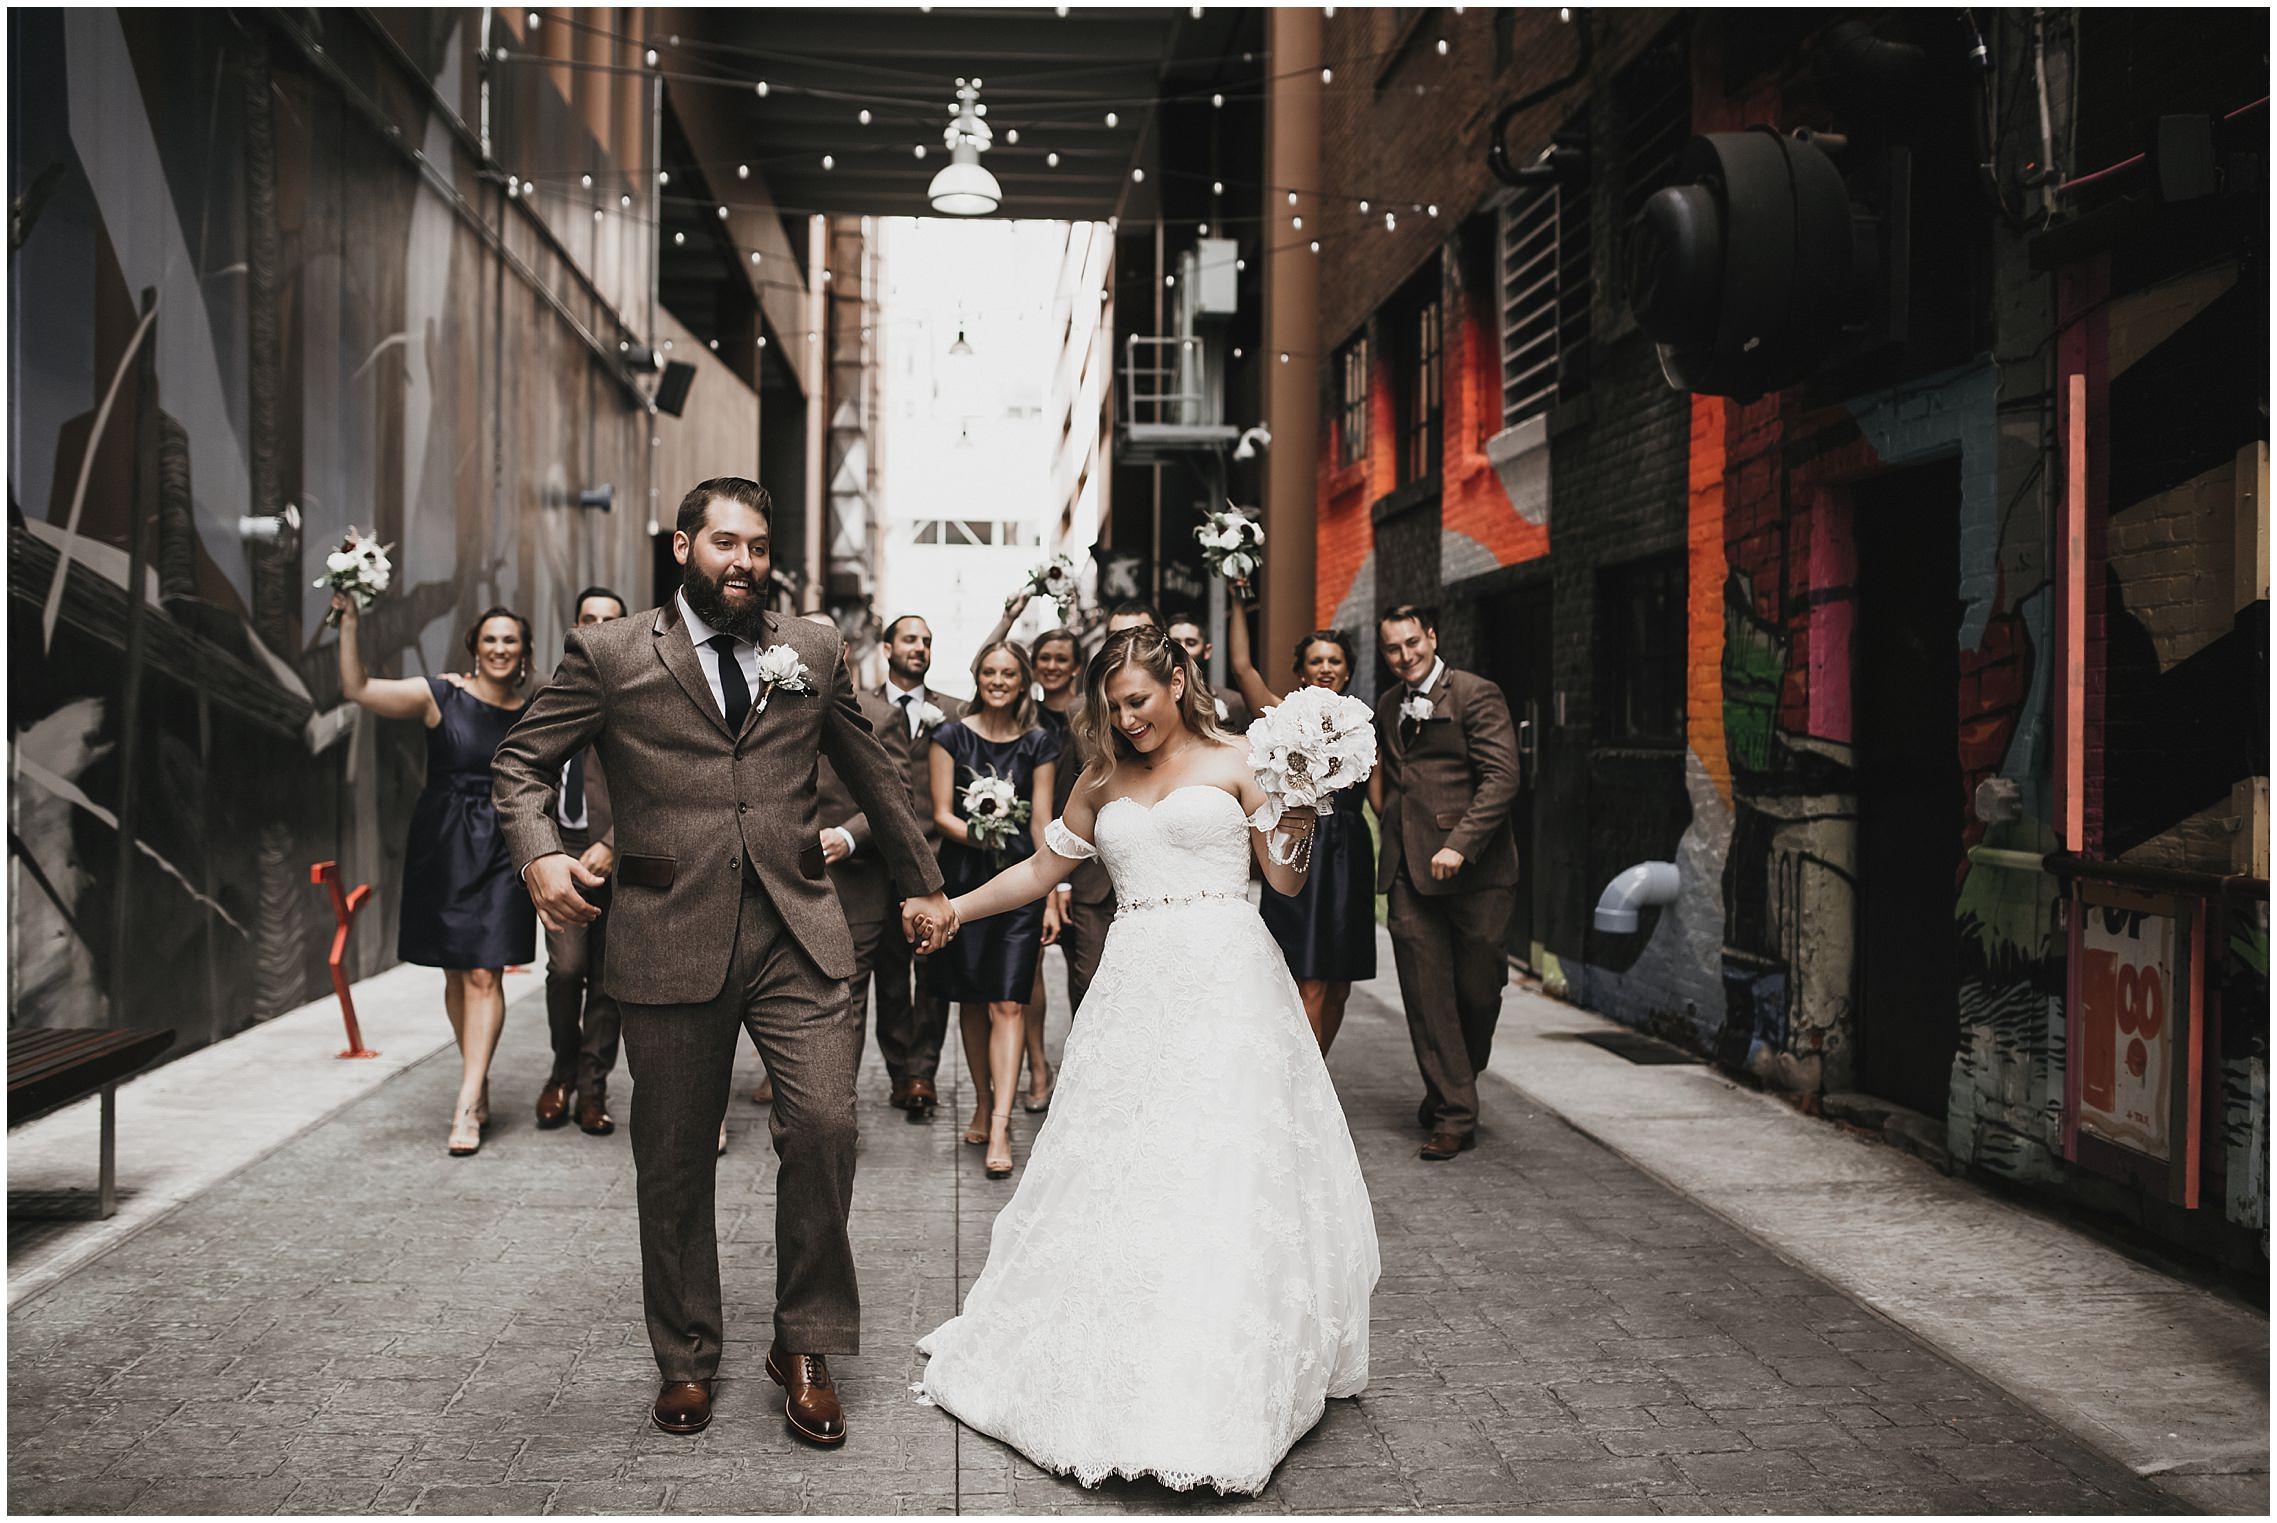 brick_and_mortar_colorado_wedding_photographer_0237.jpg